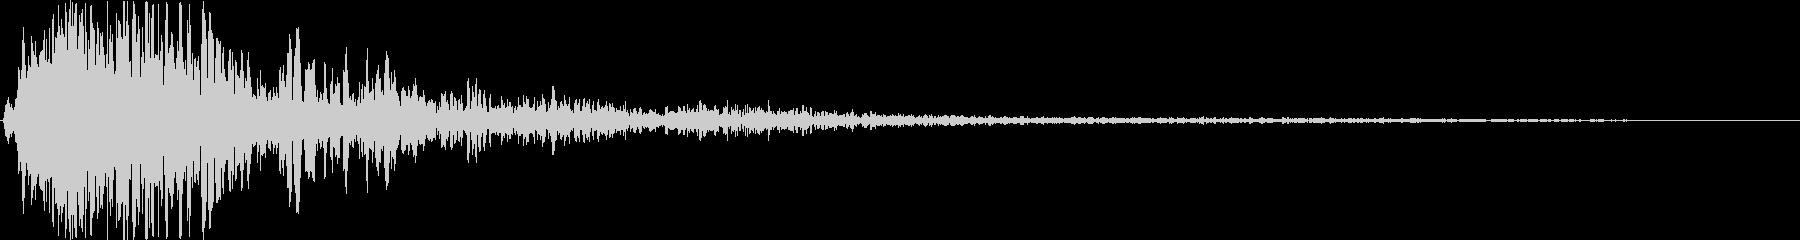 SFX爆発音01の未再生の波形